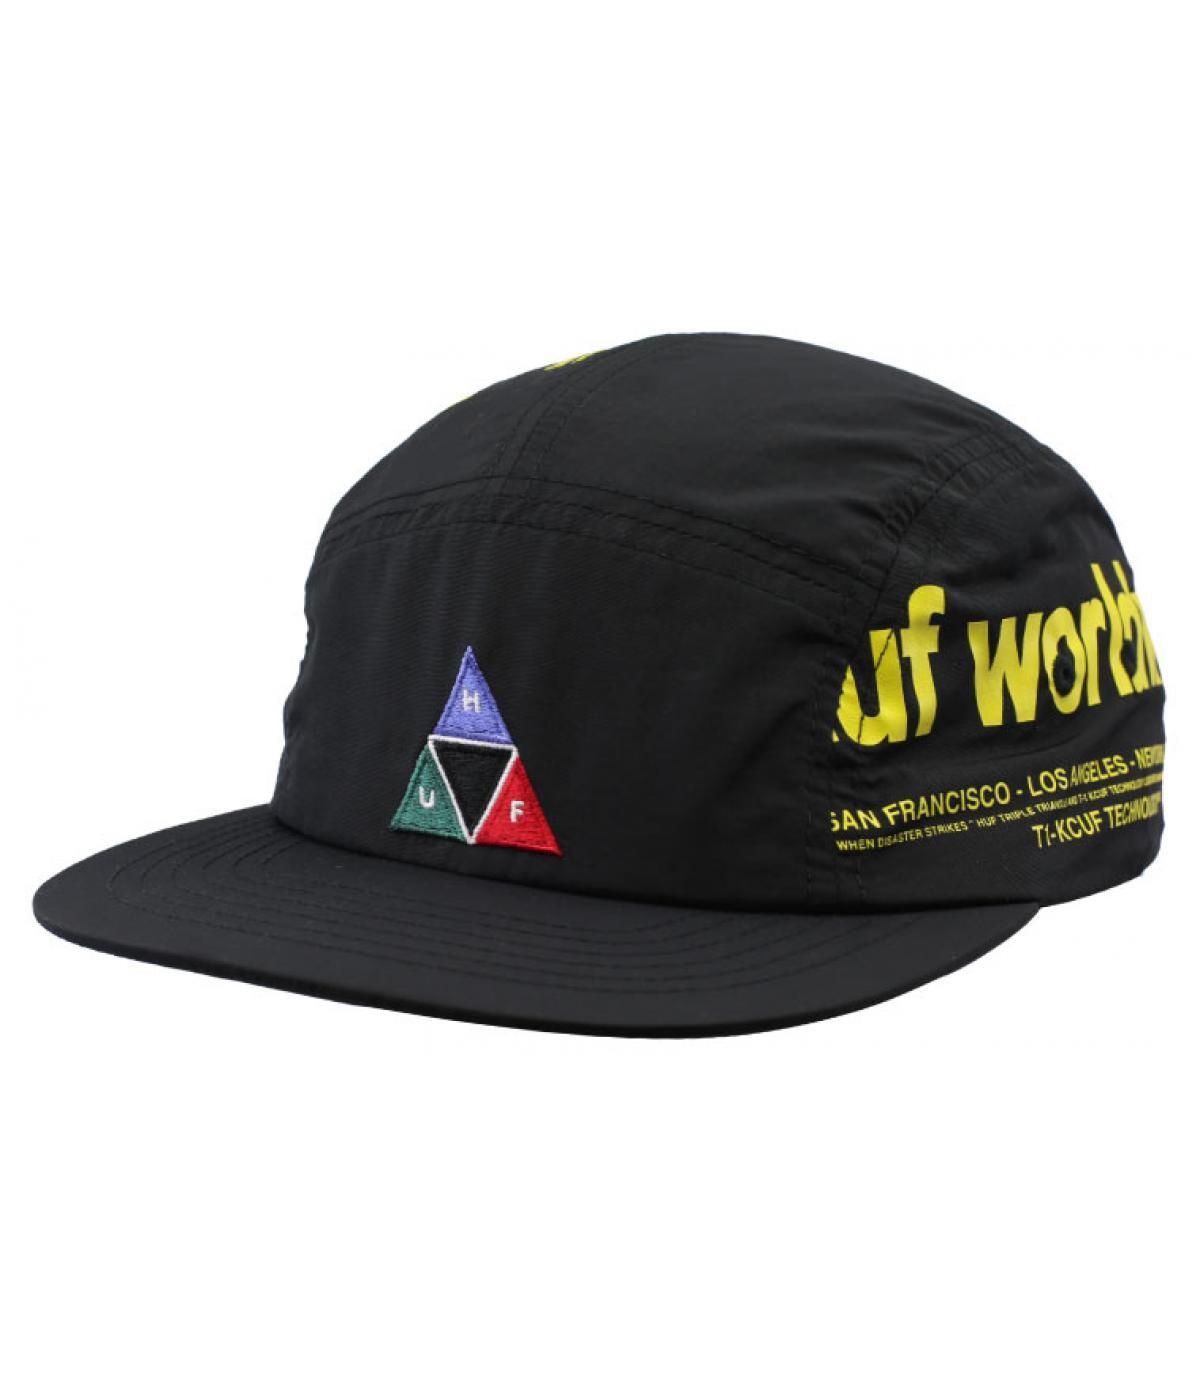 560a041dbc5da 5 panel cap - Skate cap   buy online.